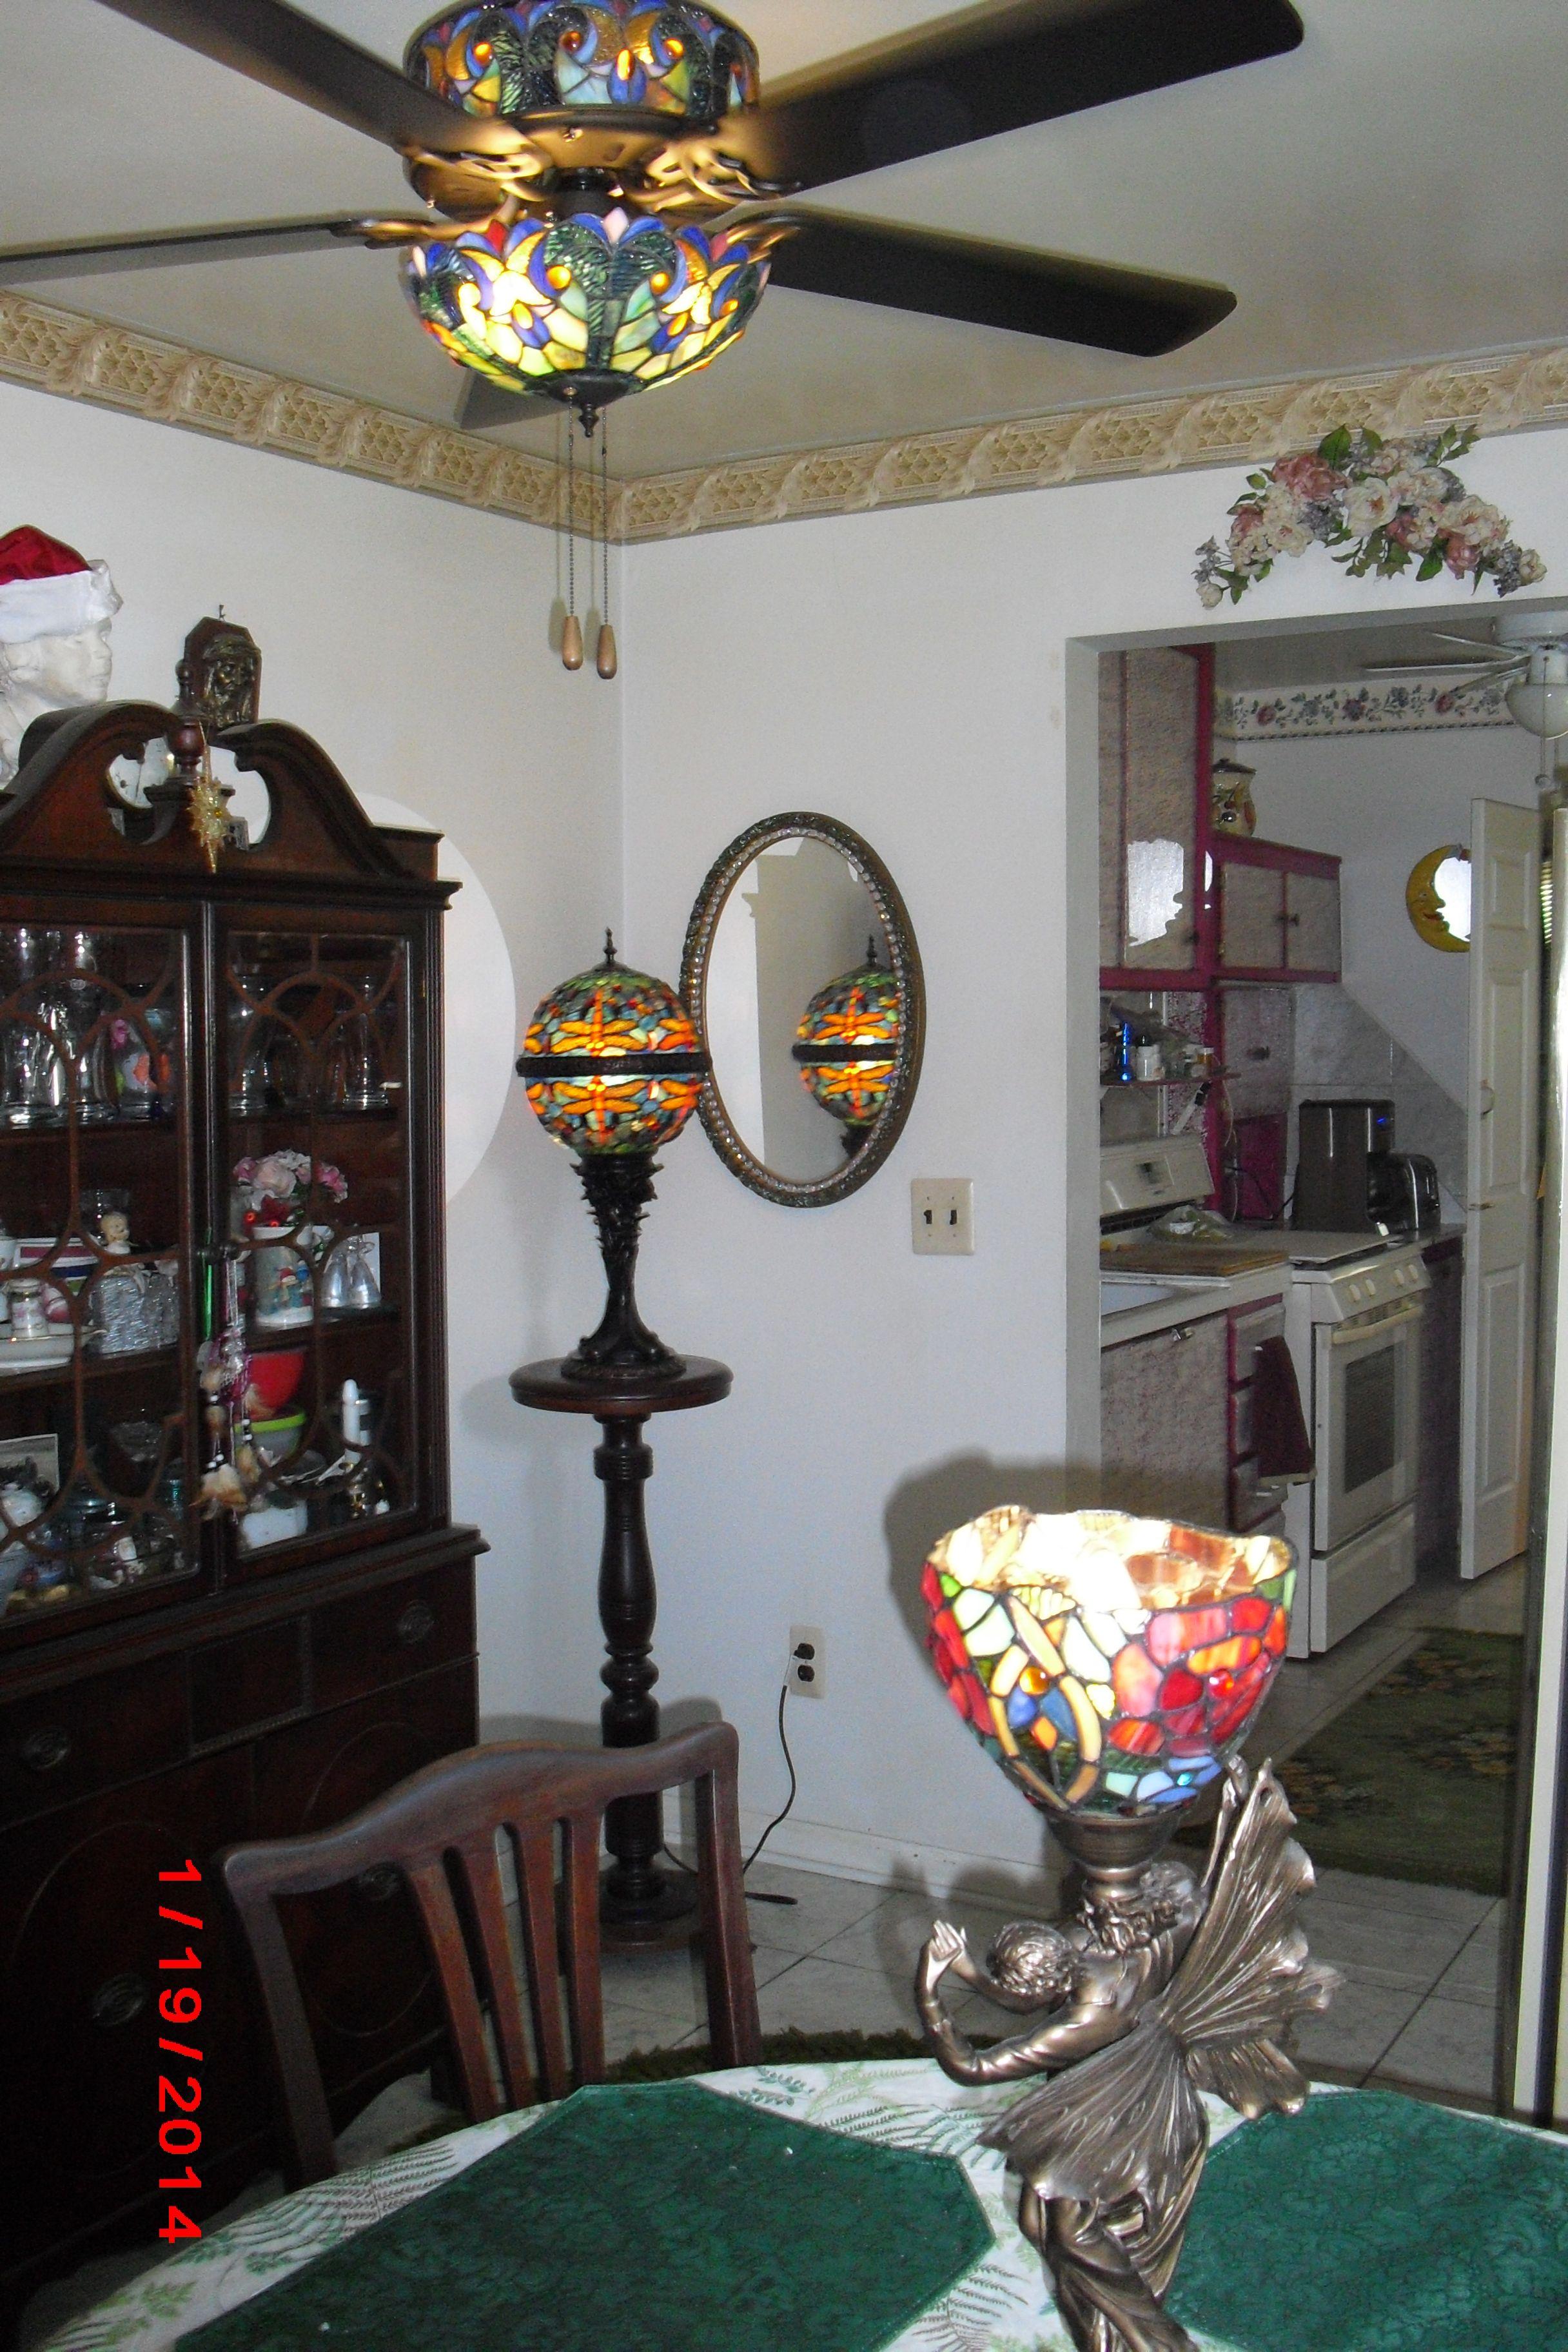 Tiffany ceiling fan Ideas for the House Pinterest